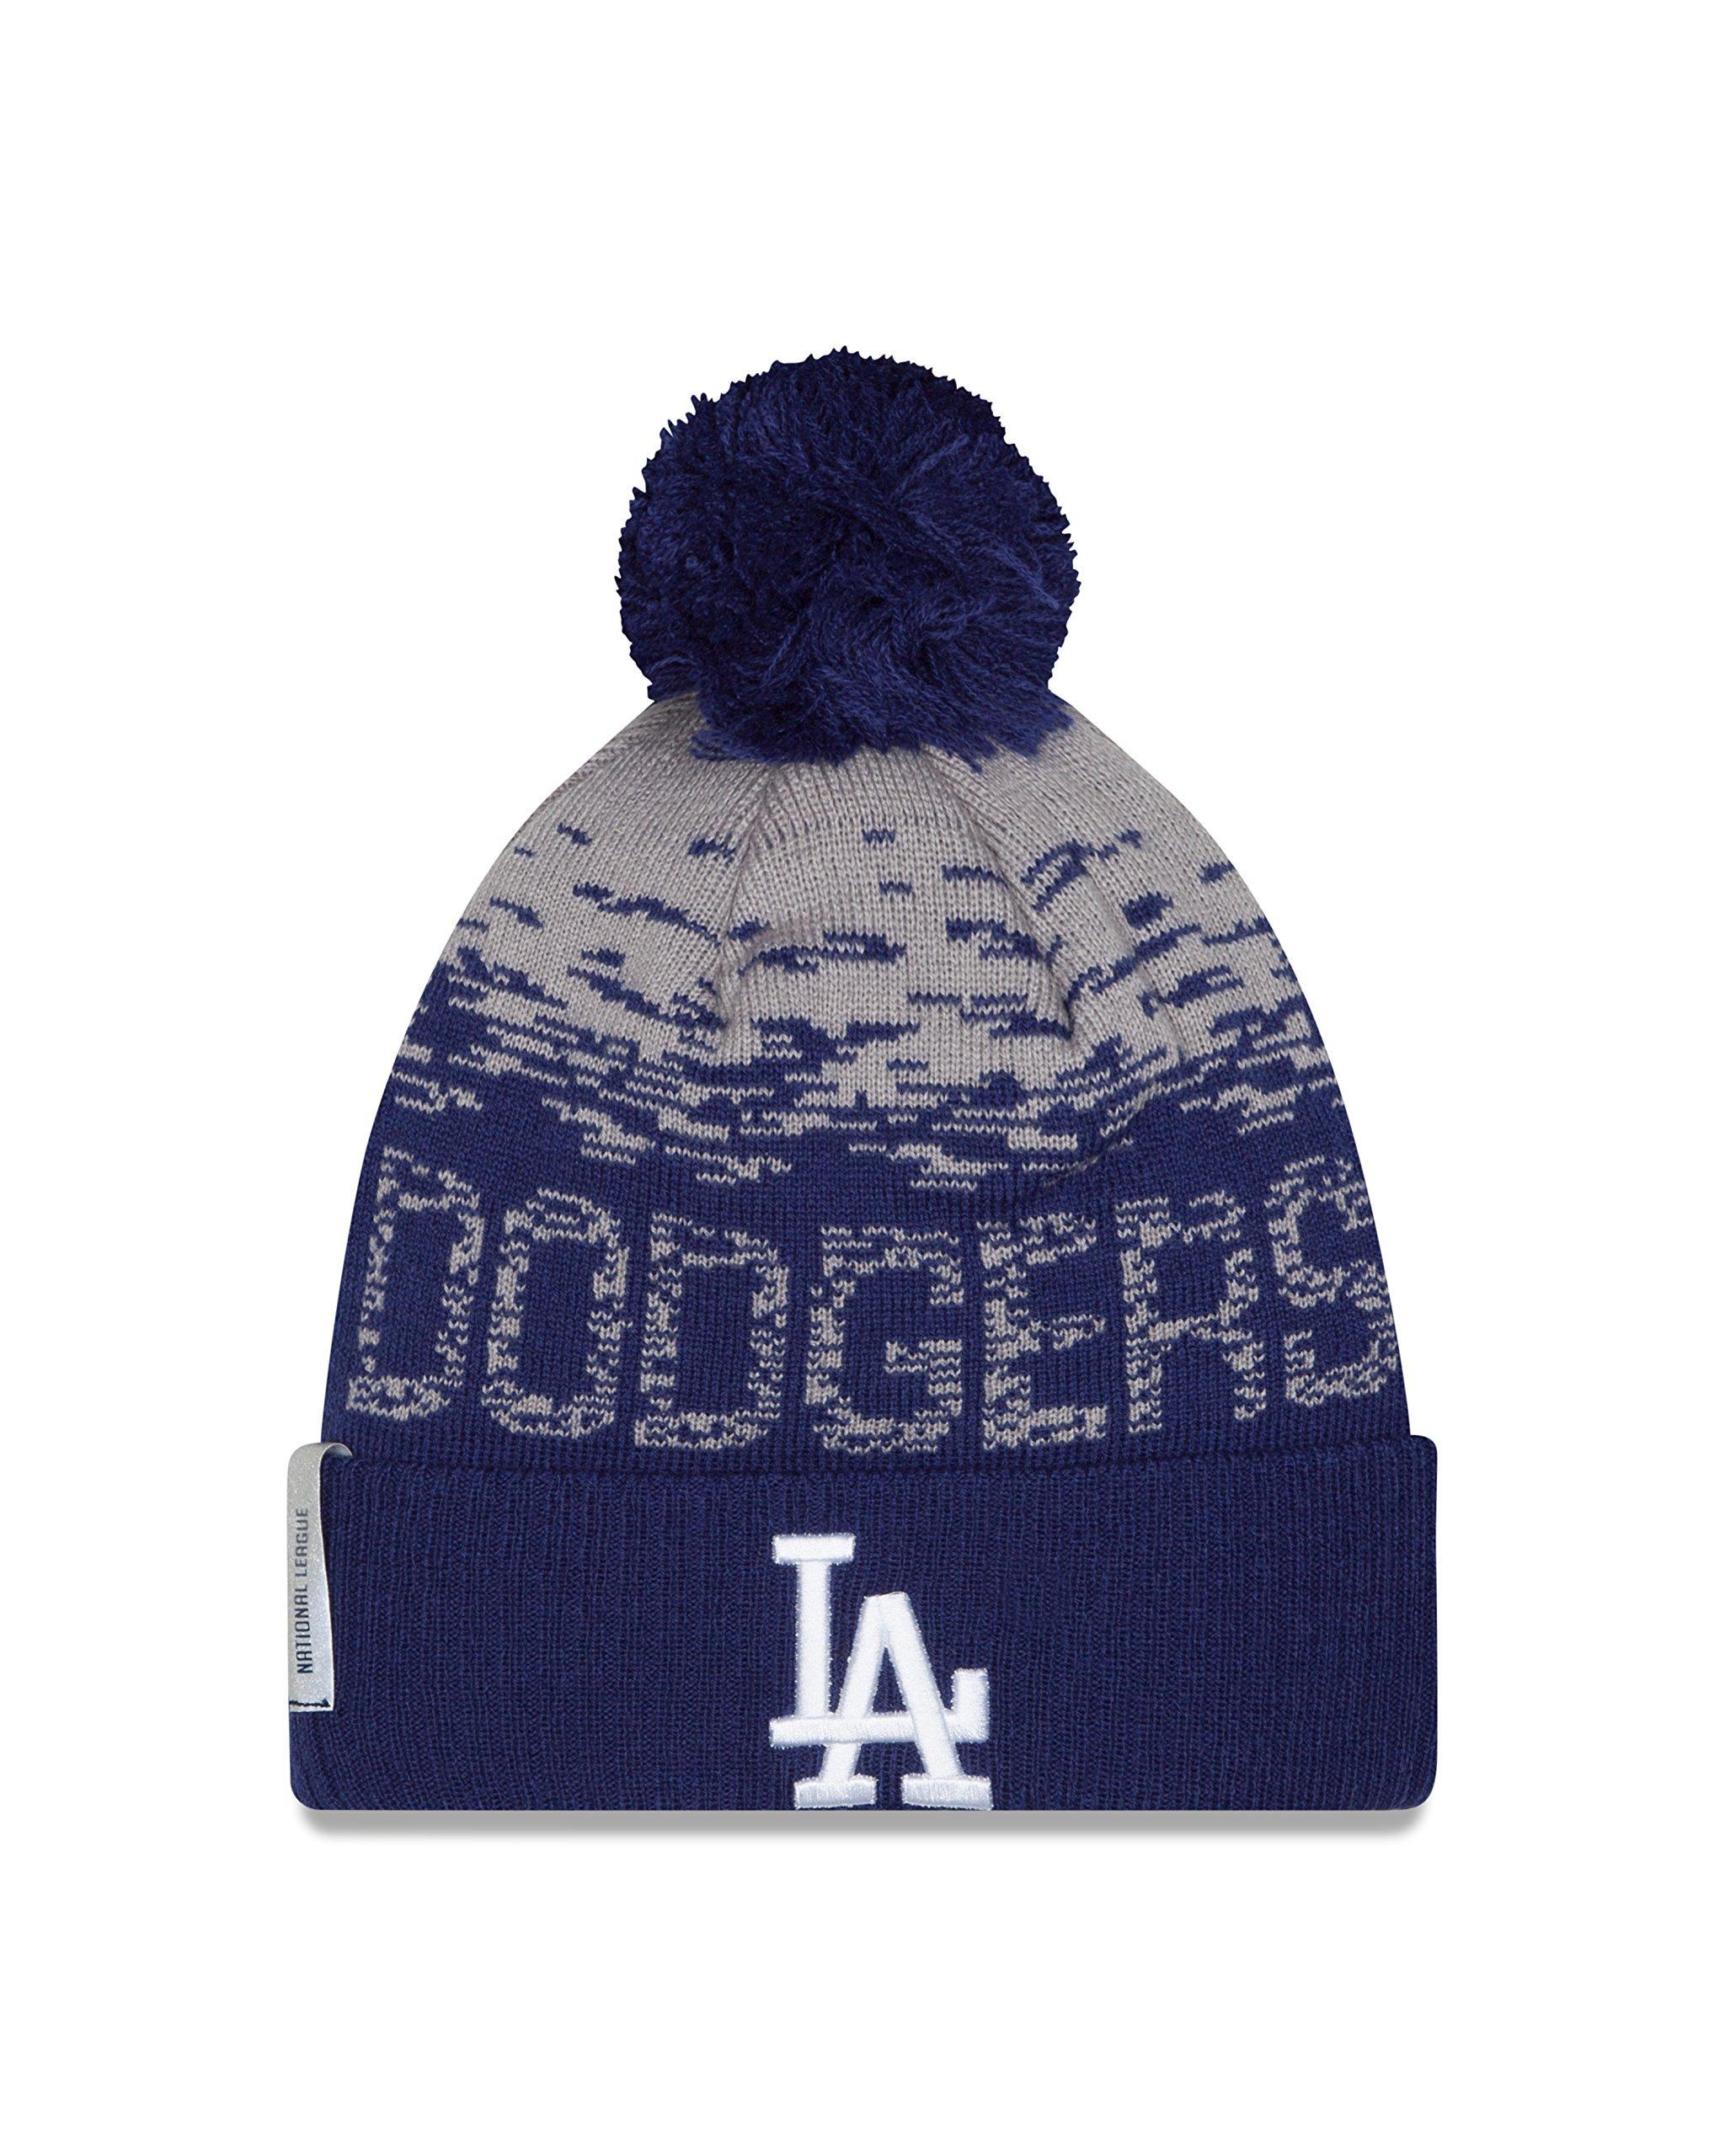 ... MLB 2016 On Field Sport Knit Beanie famous brand e5c97 ca07a  New Era  Knit Baltimore Ravens Purple On Field Sideline Winter Stocking Beanie Pom  Hat Cap ... d036961b6